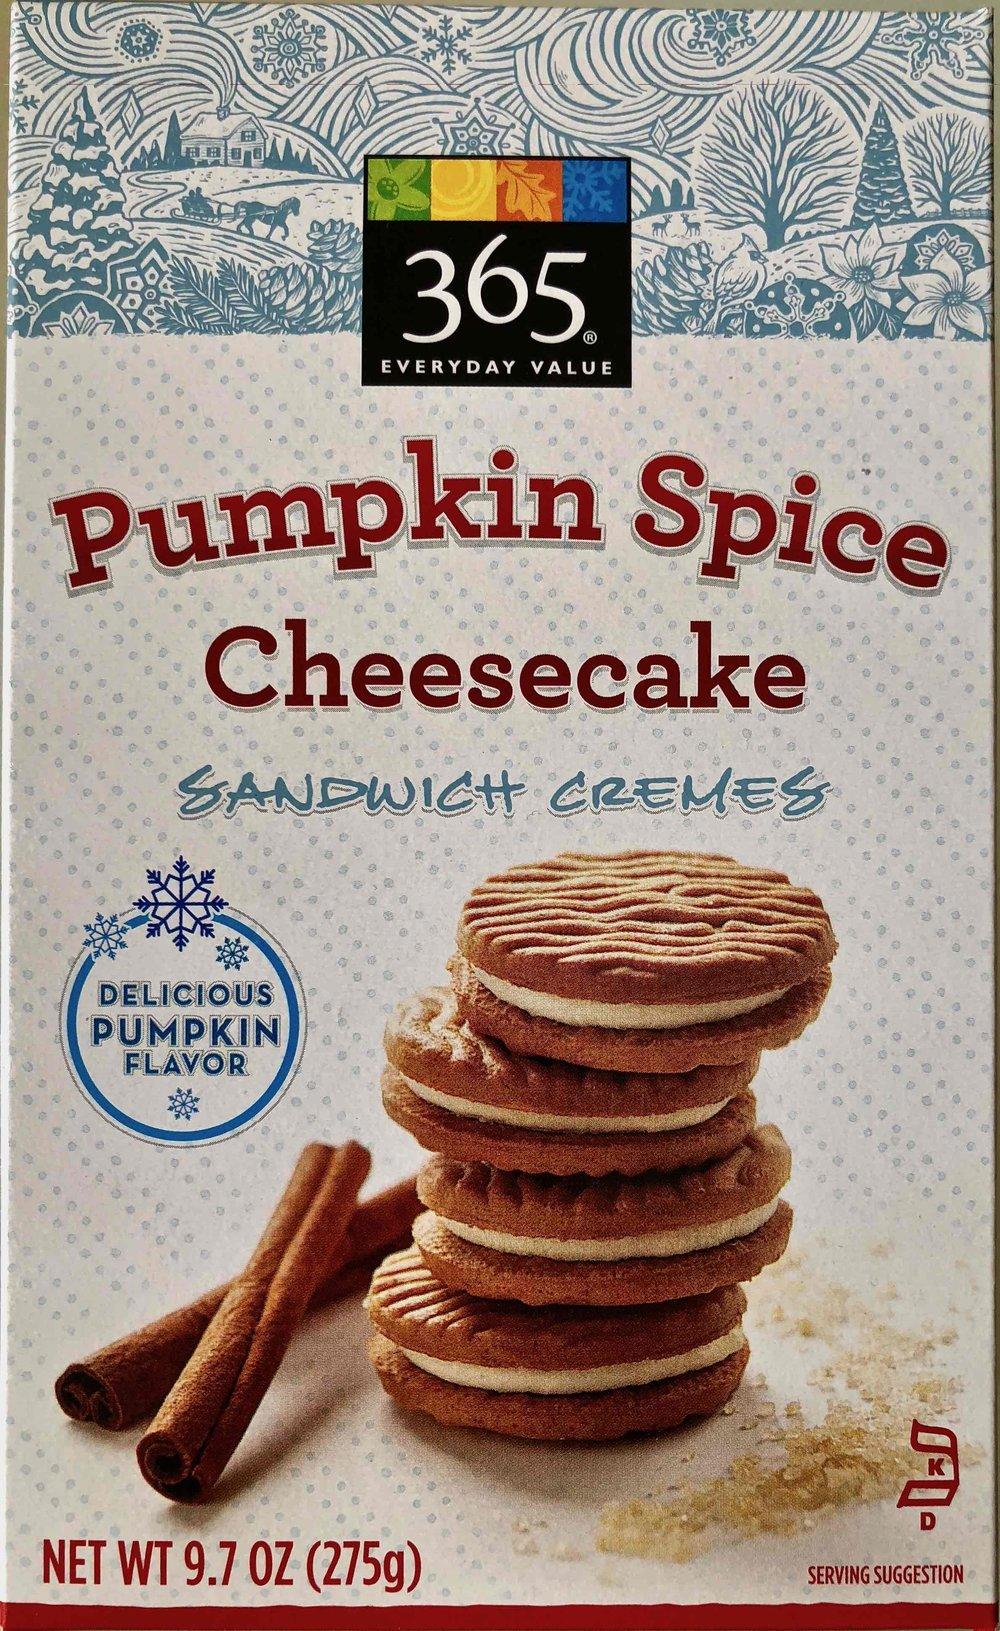 Pumpkin Spice Cheesecake Sandwich Cremes